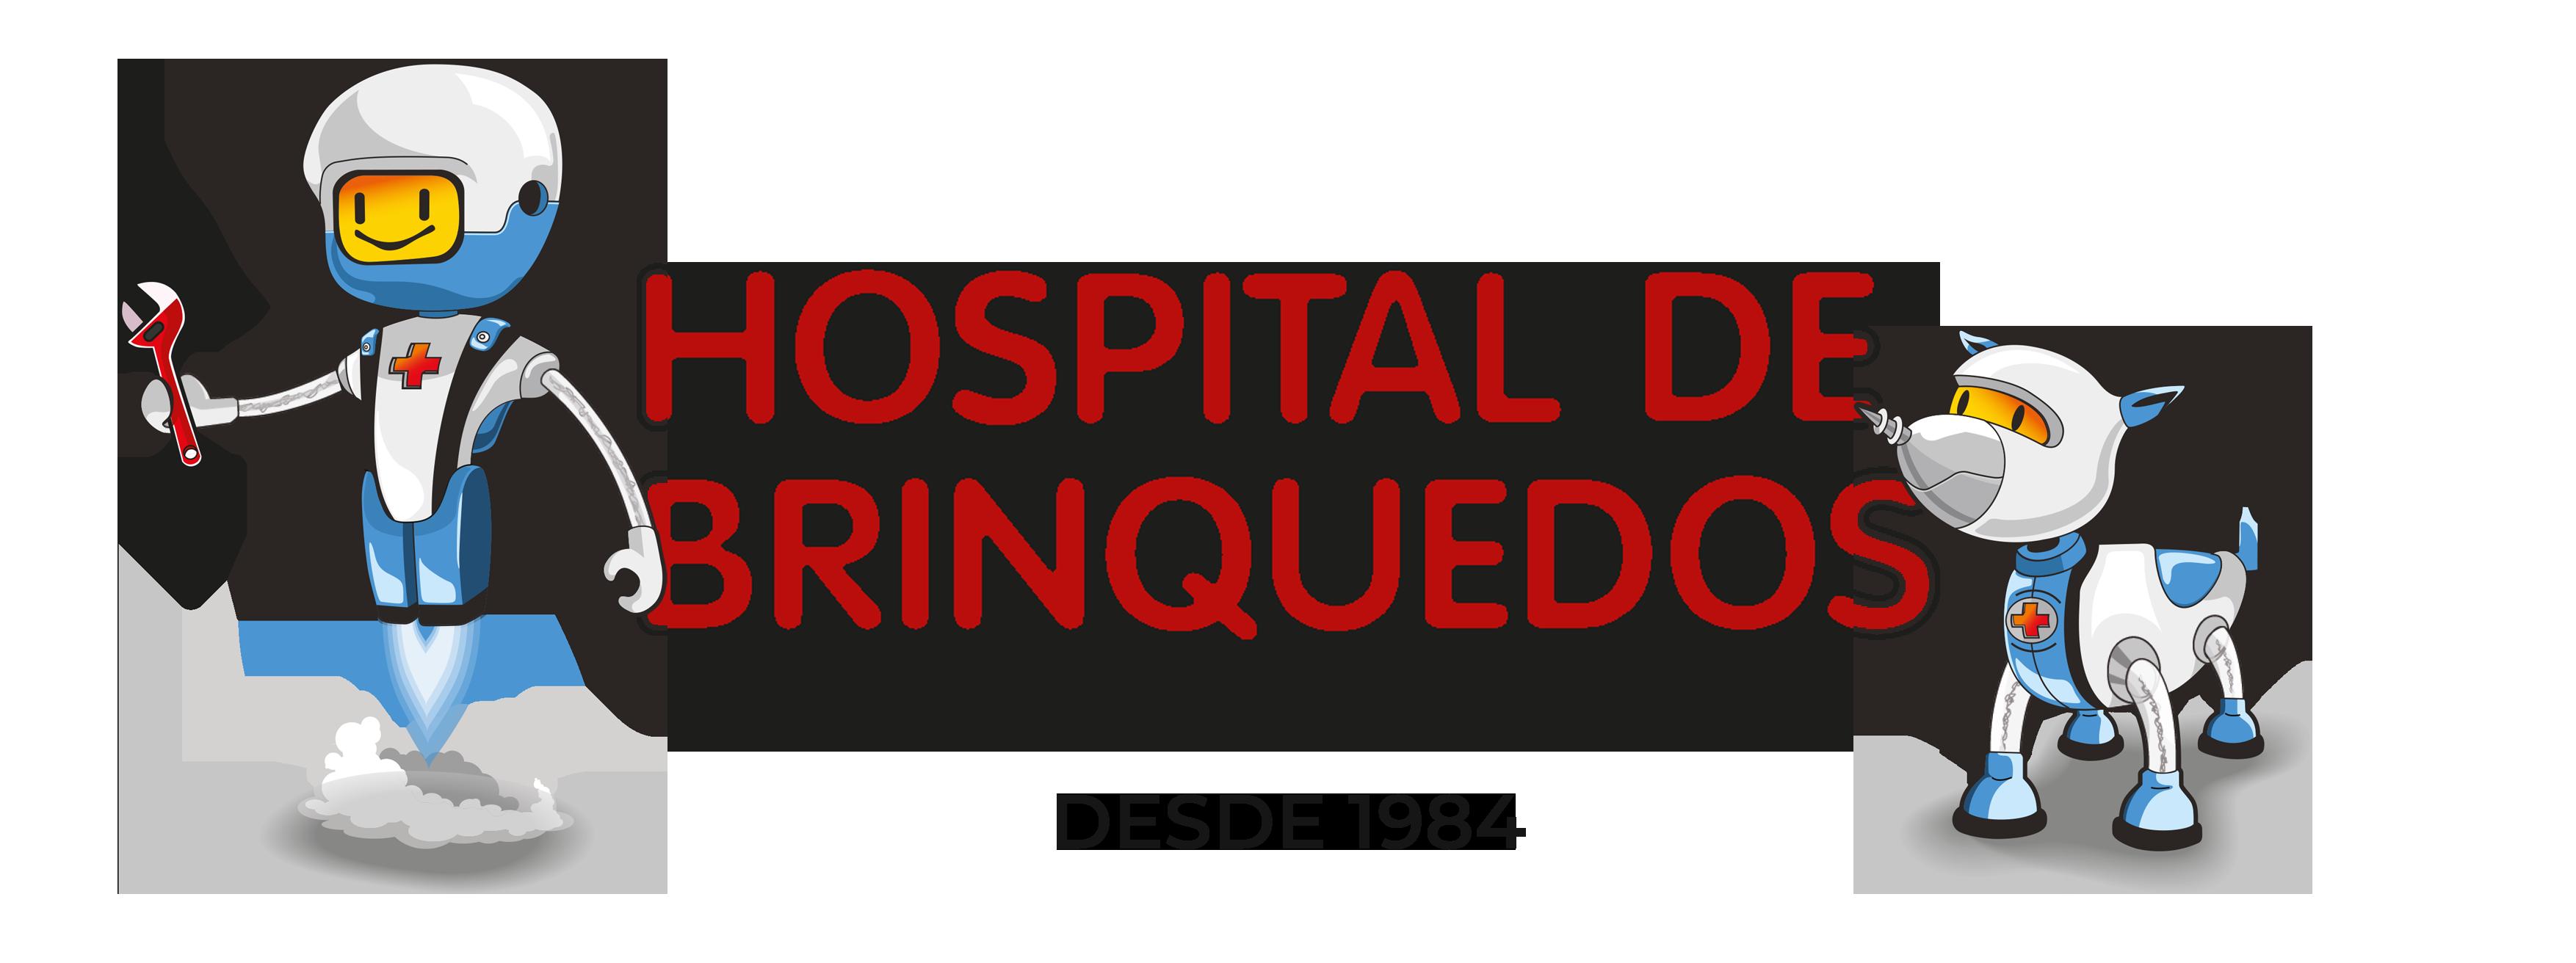 Hospital de Brinquedos Londrina